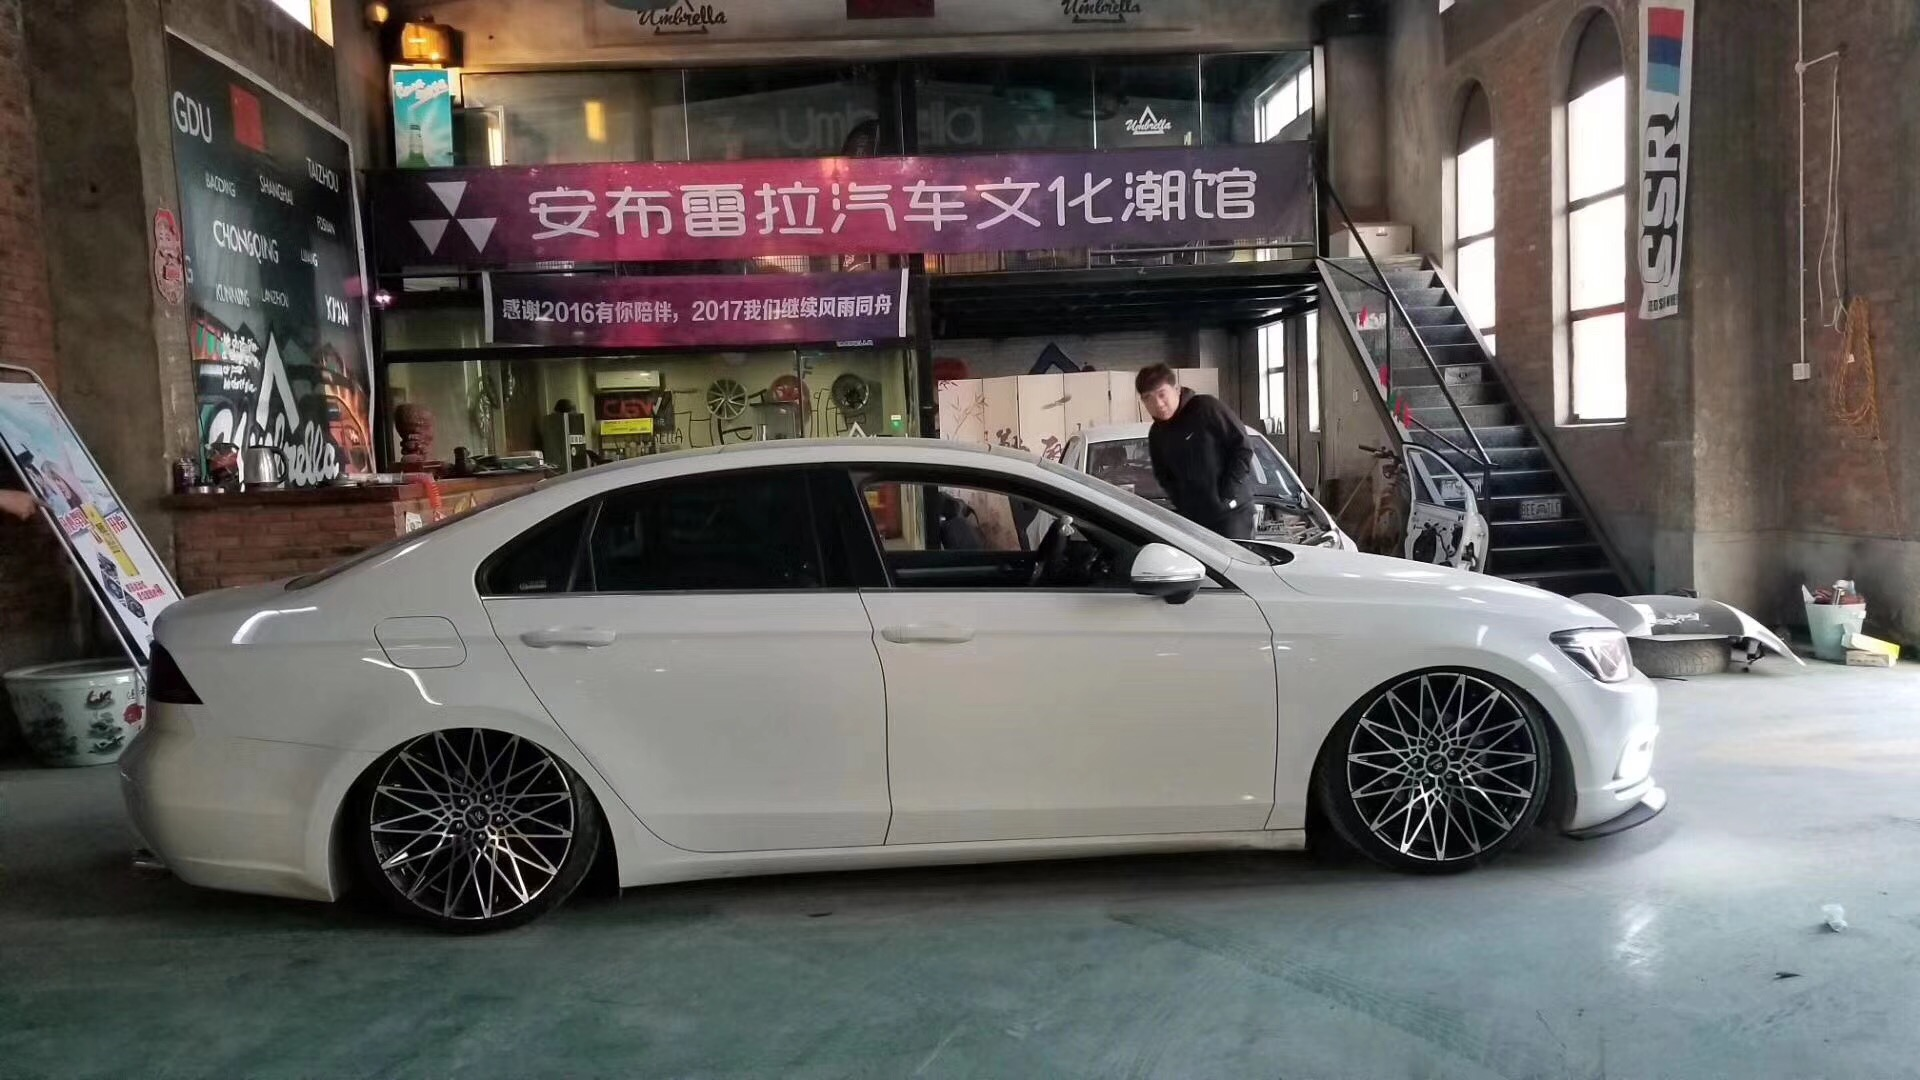 accuair中国总代李洋分享大众凌渡改装airbft气动避震